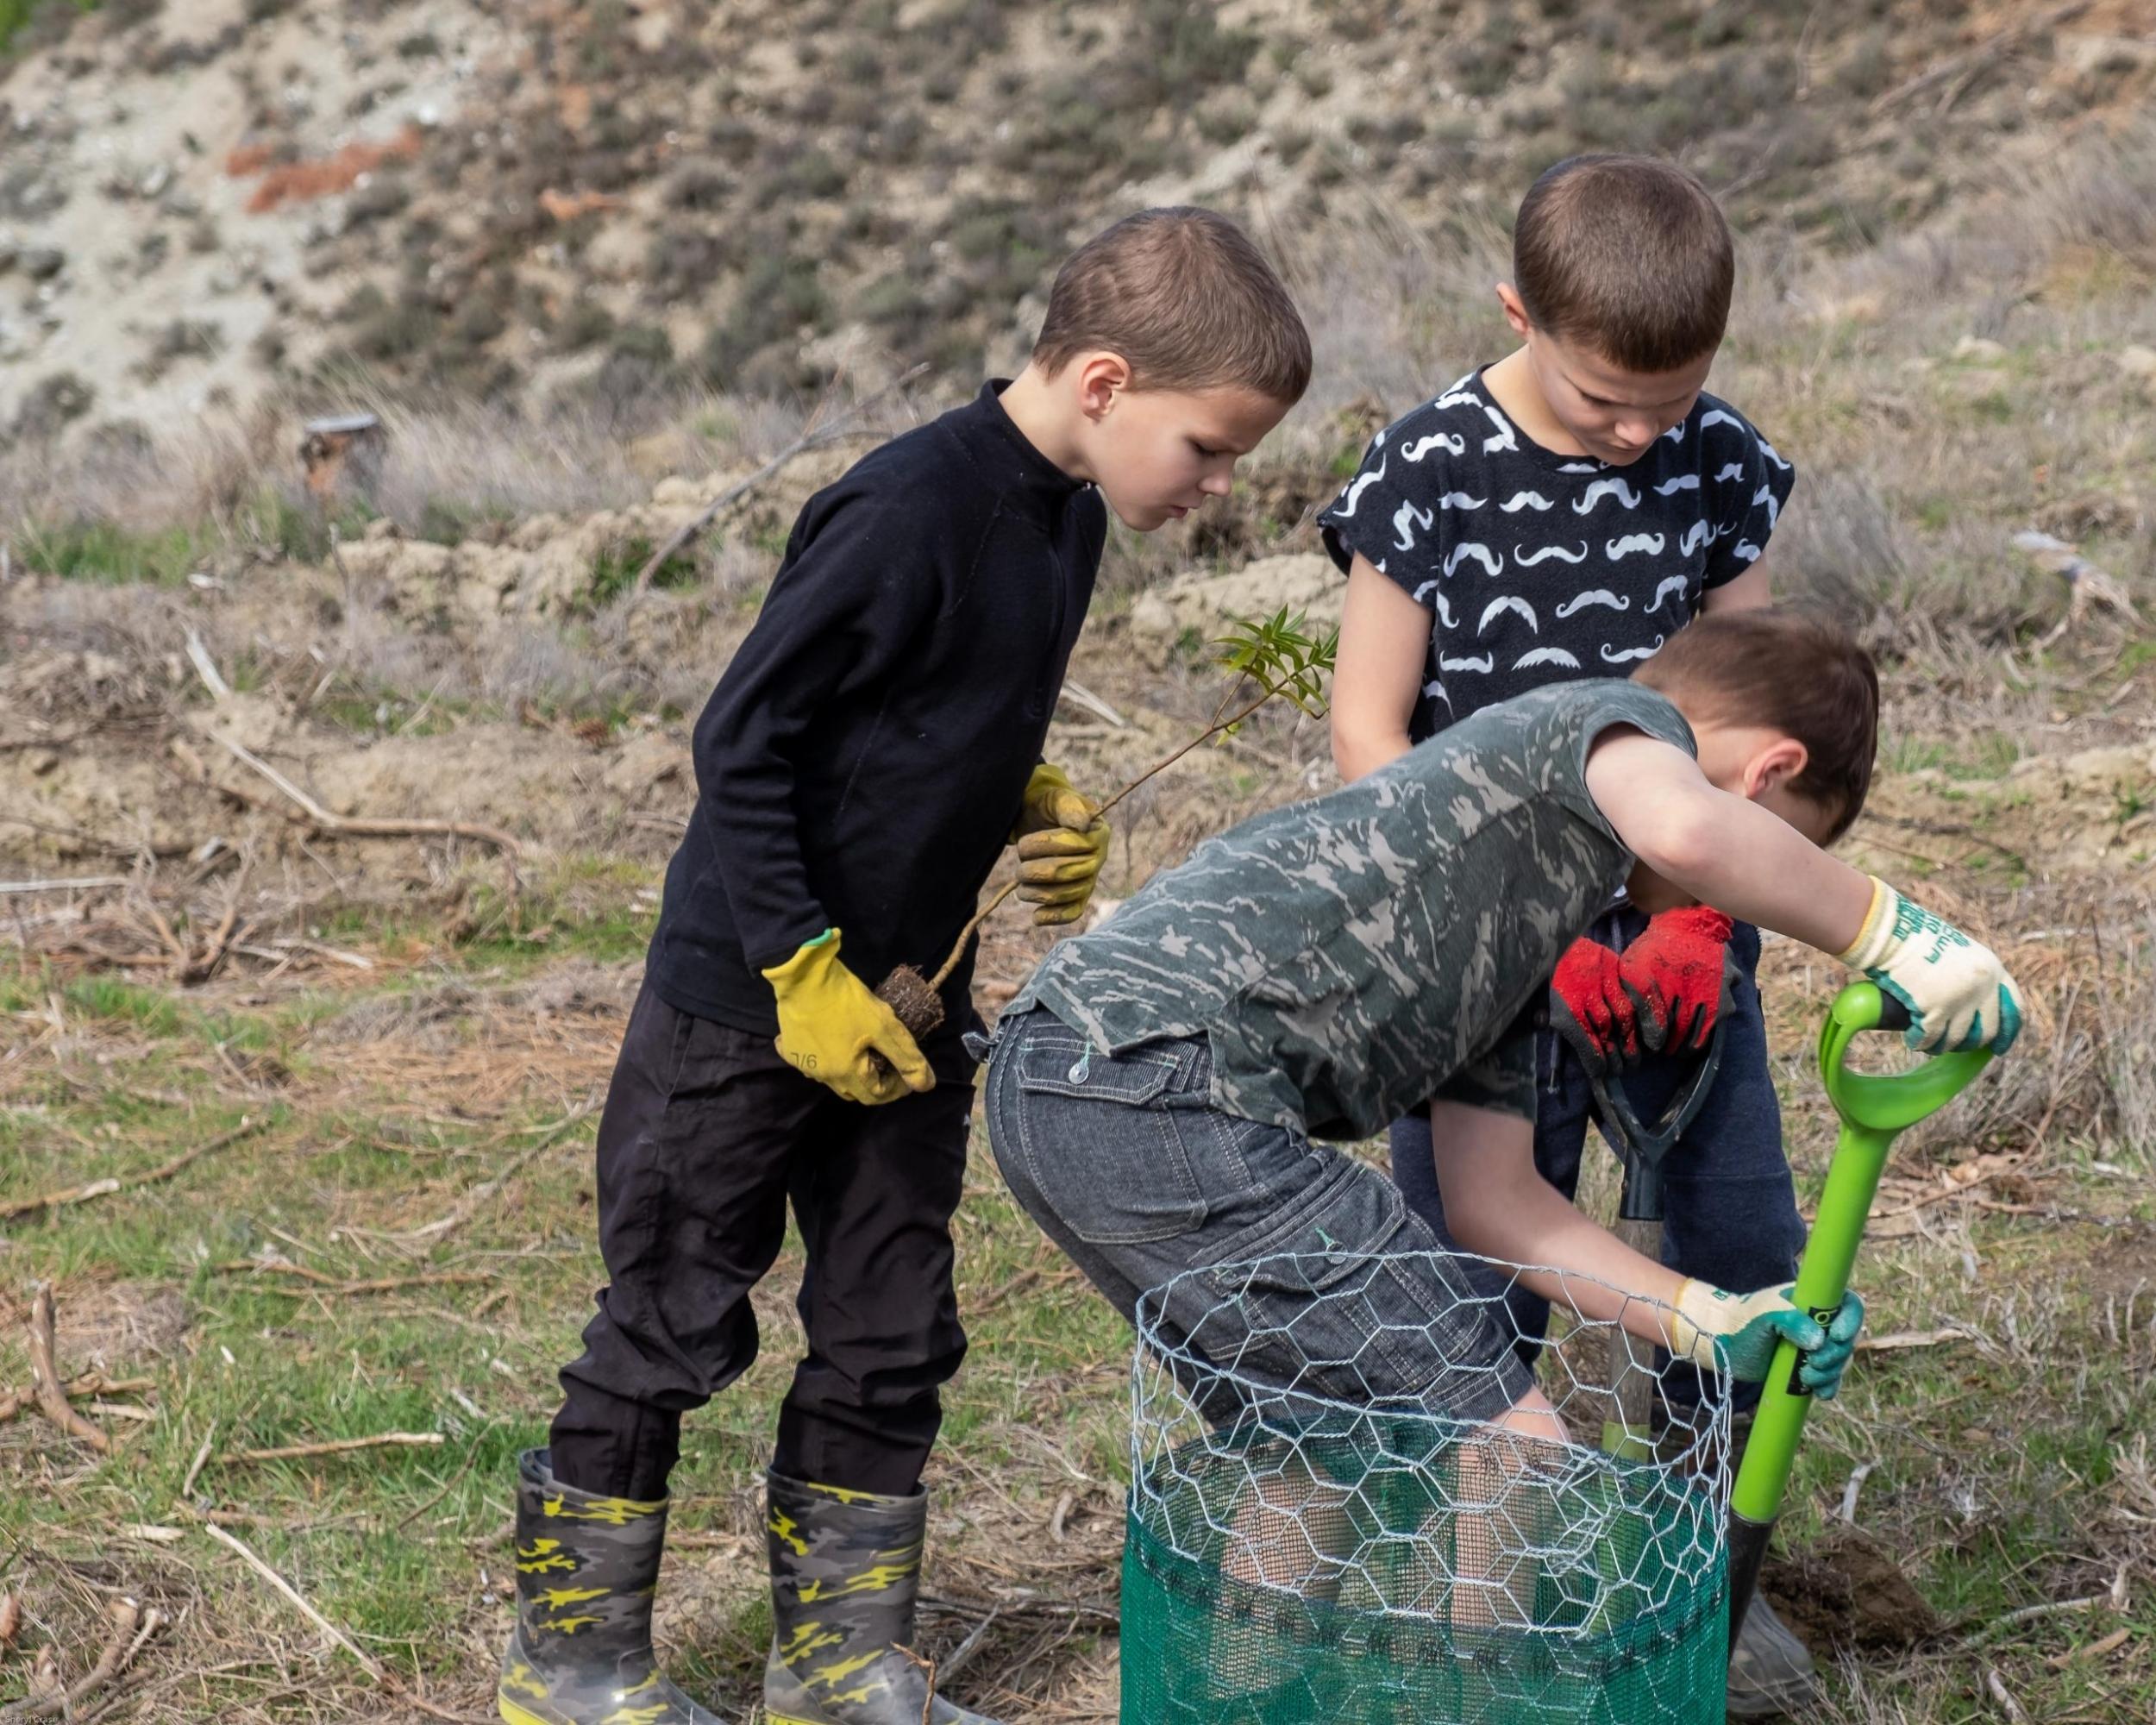 Kids_planting_native_trees_community_planting